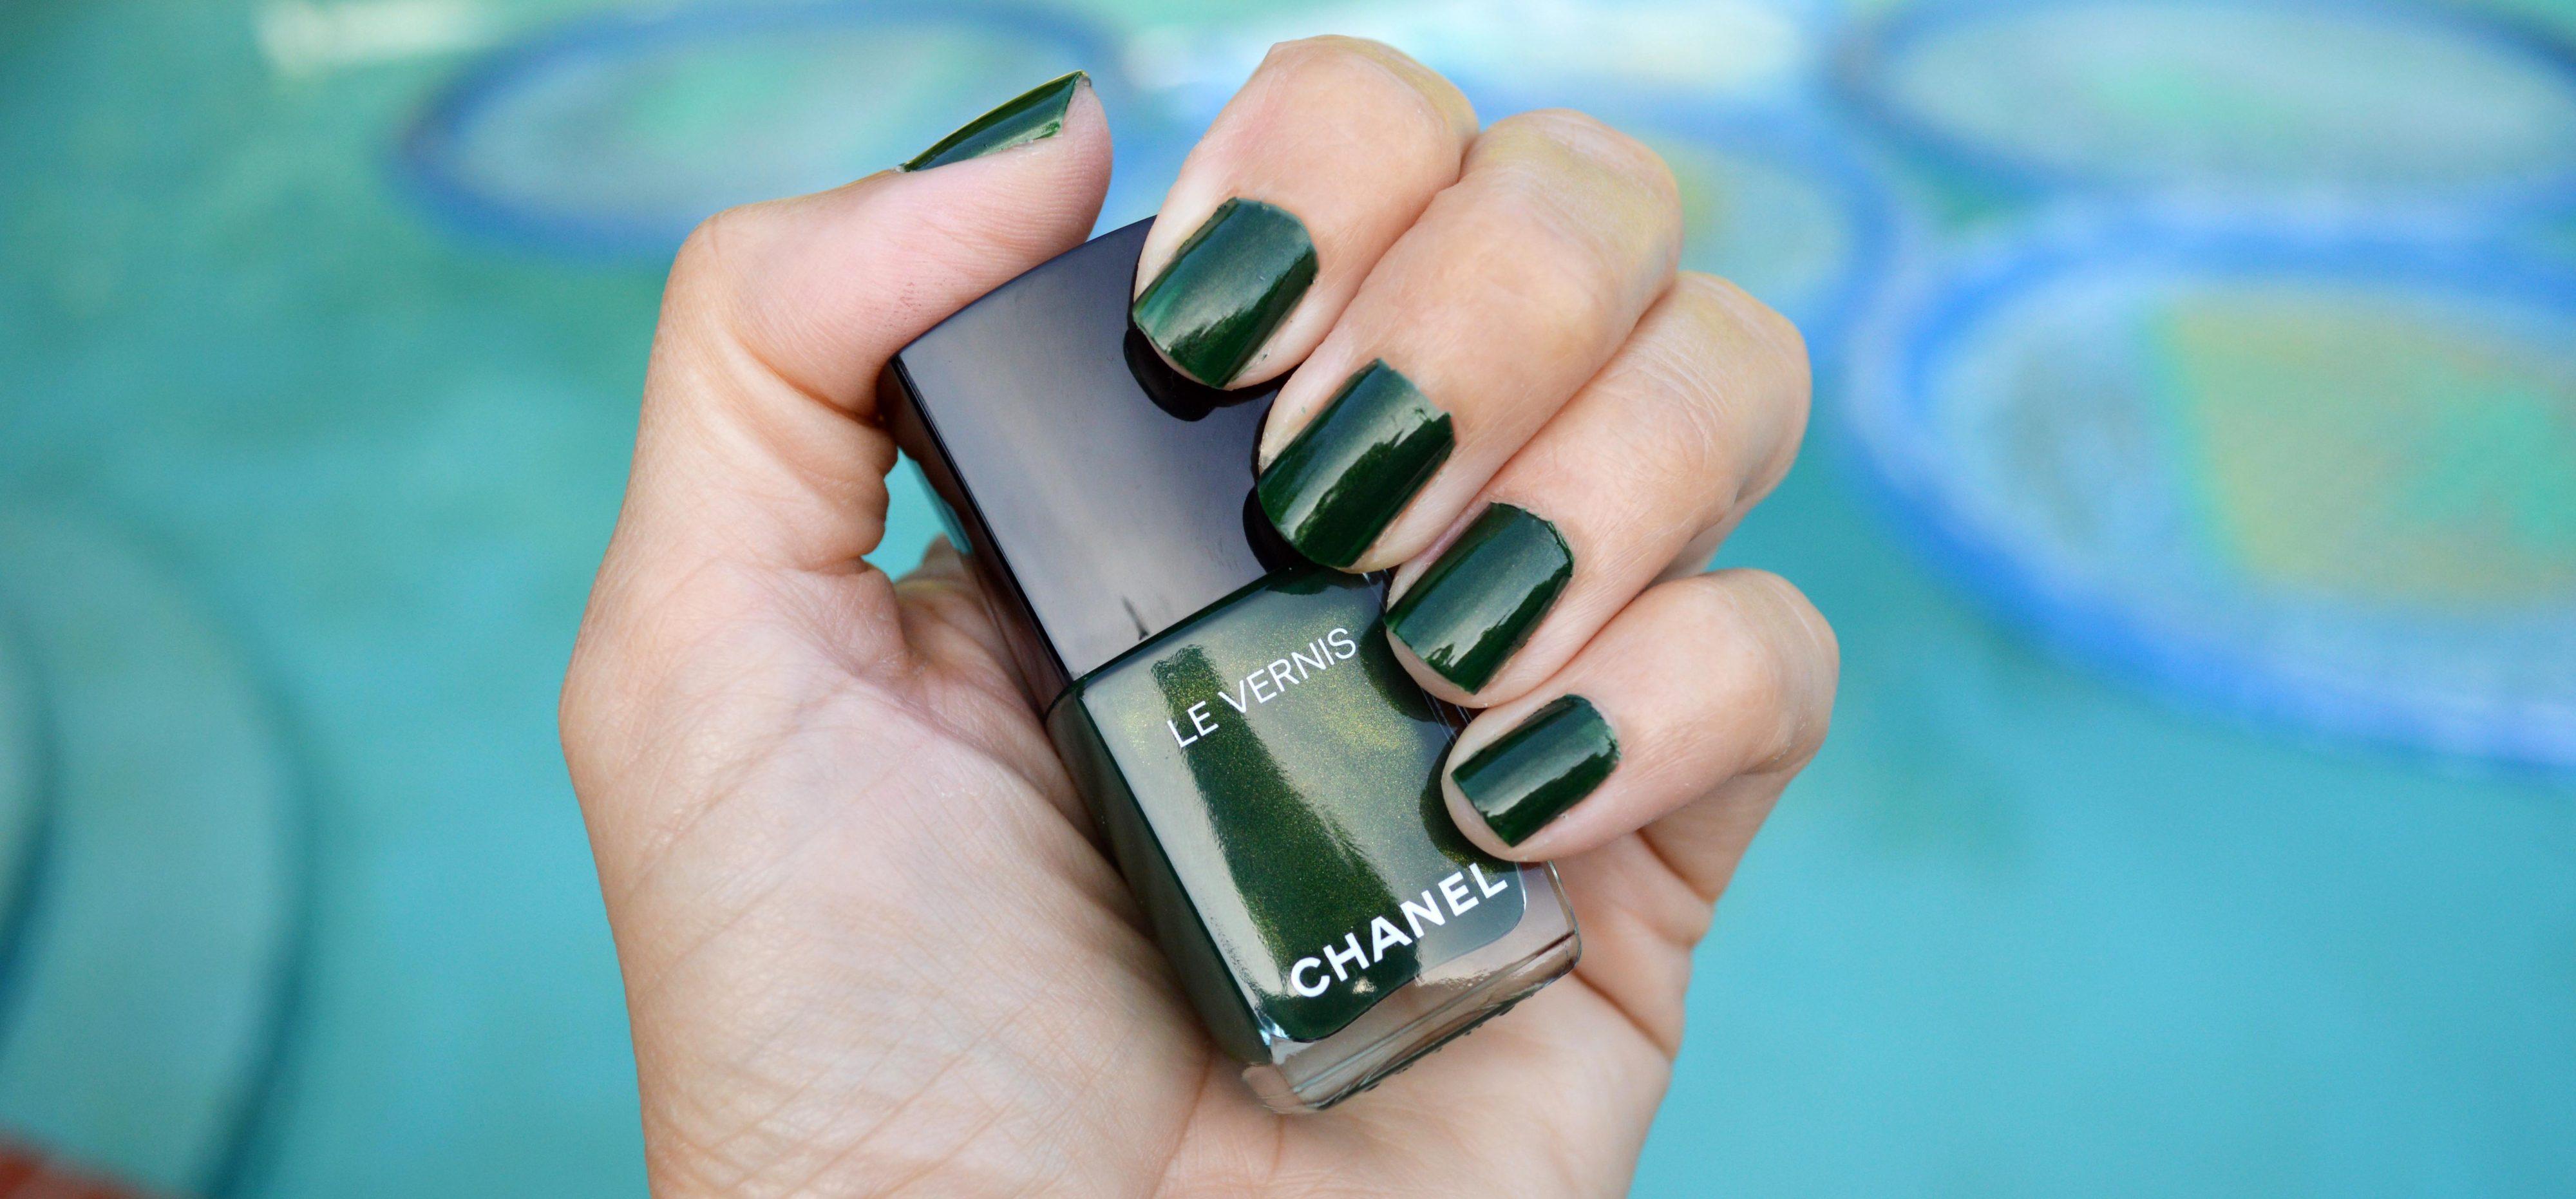 Chanel Emeraude nail polish for summer 2016 review